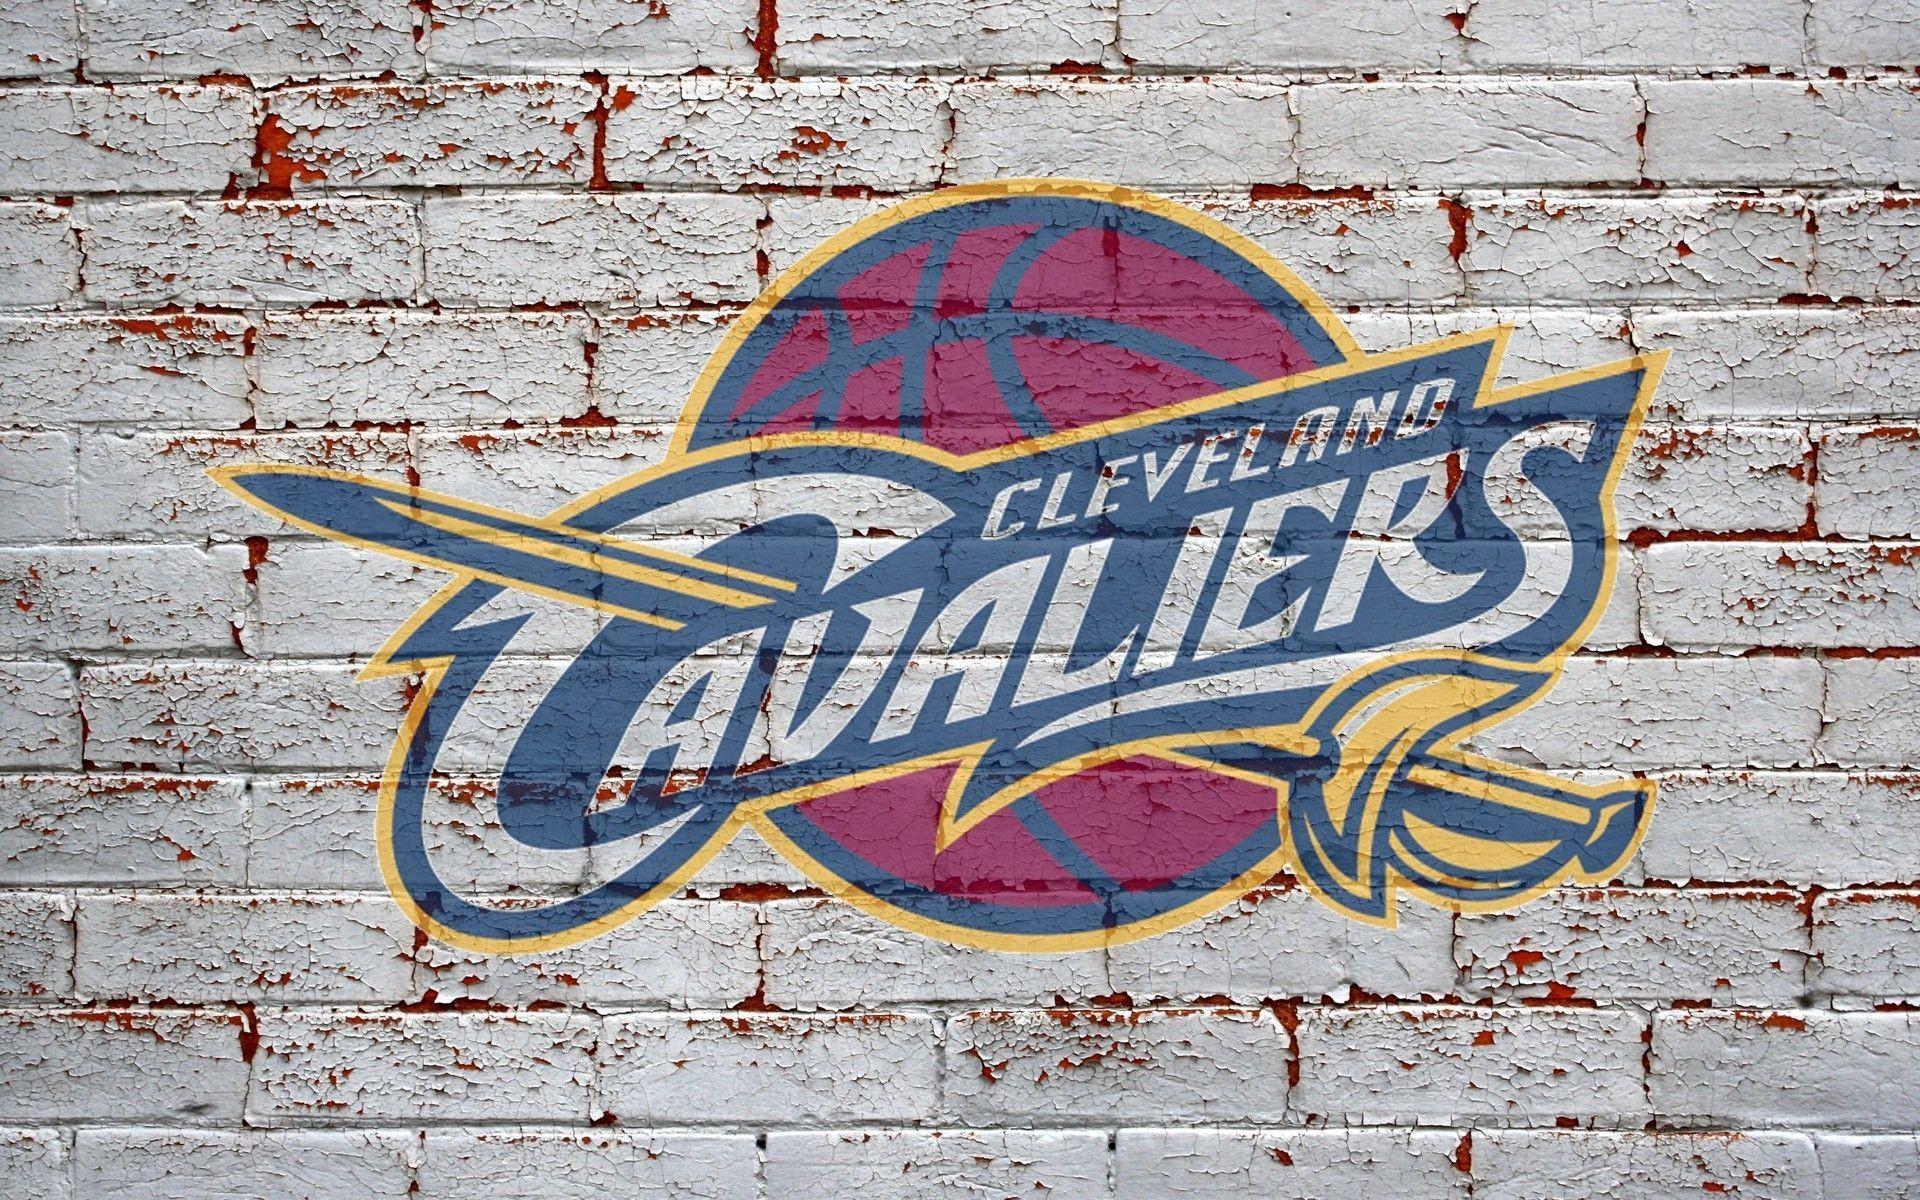 CLEVELAND CAVALIERS Nba Basketball team logo wallpaper Wallpapers HD